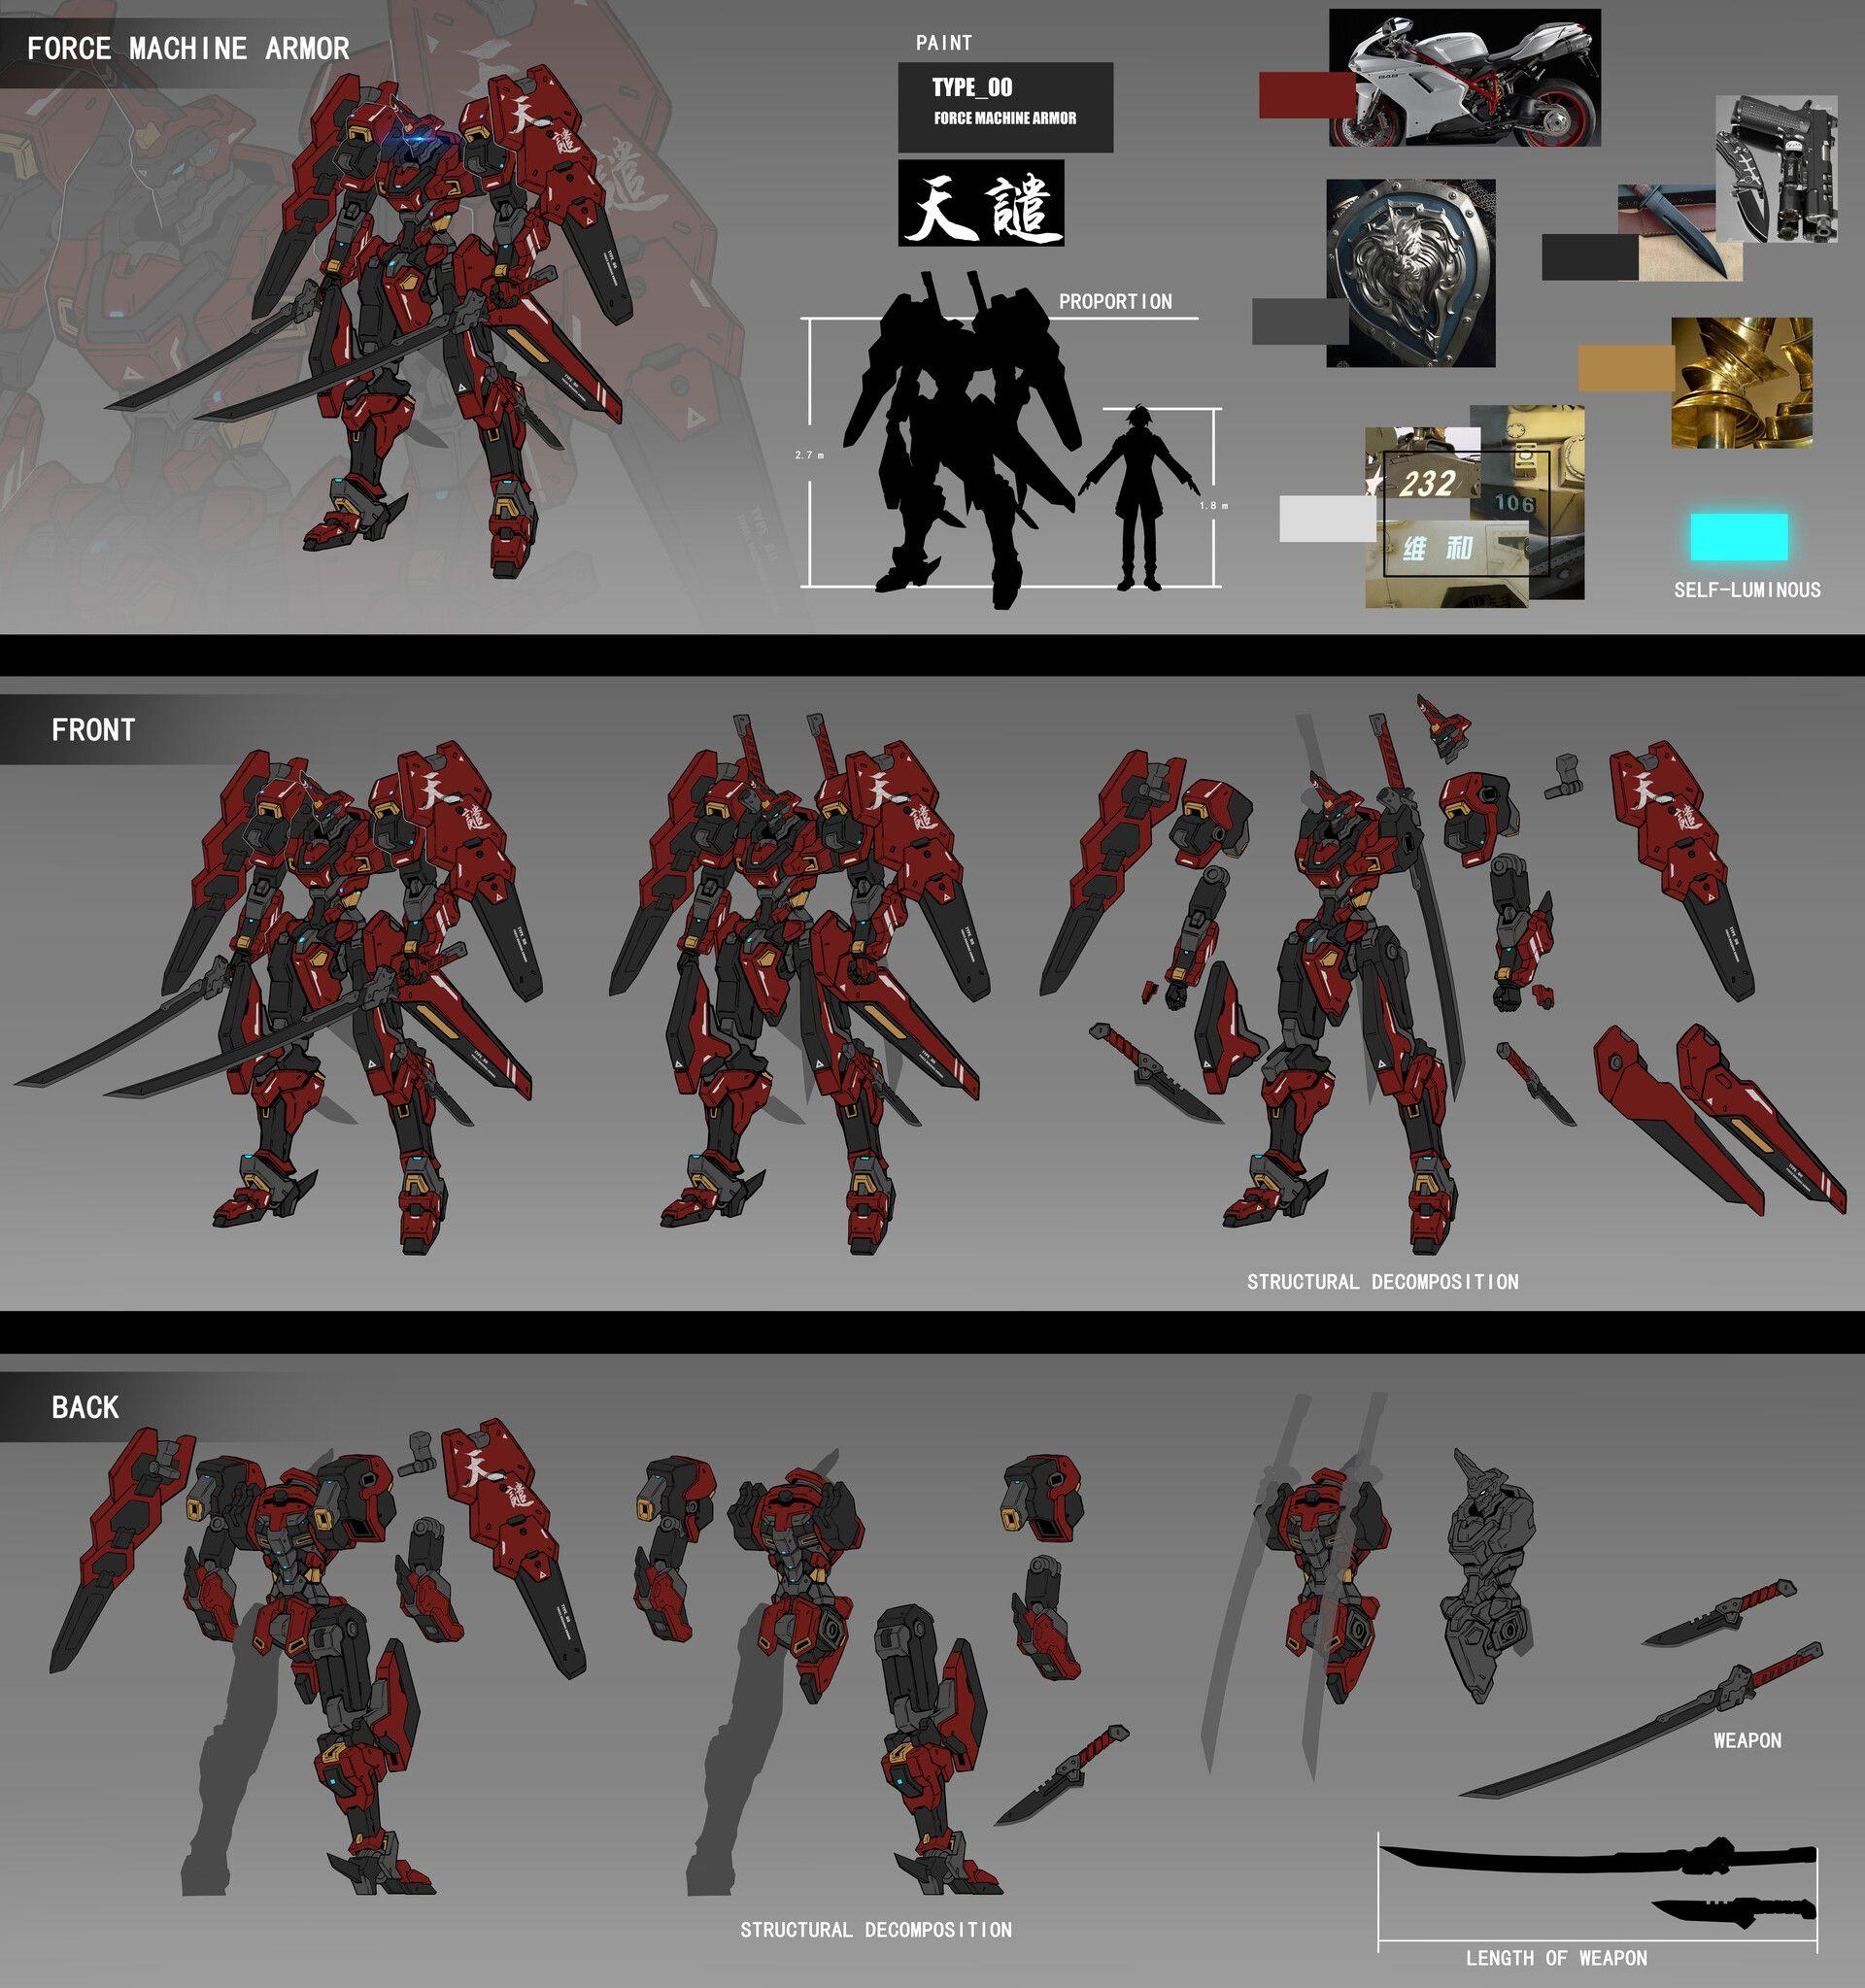 ArtStation 天谴机甲完整设计, Sure Wang Robots concept, Robot